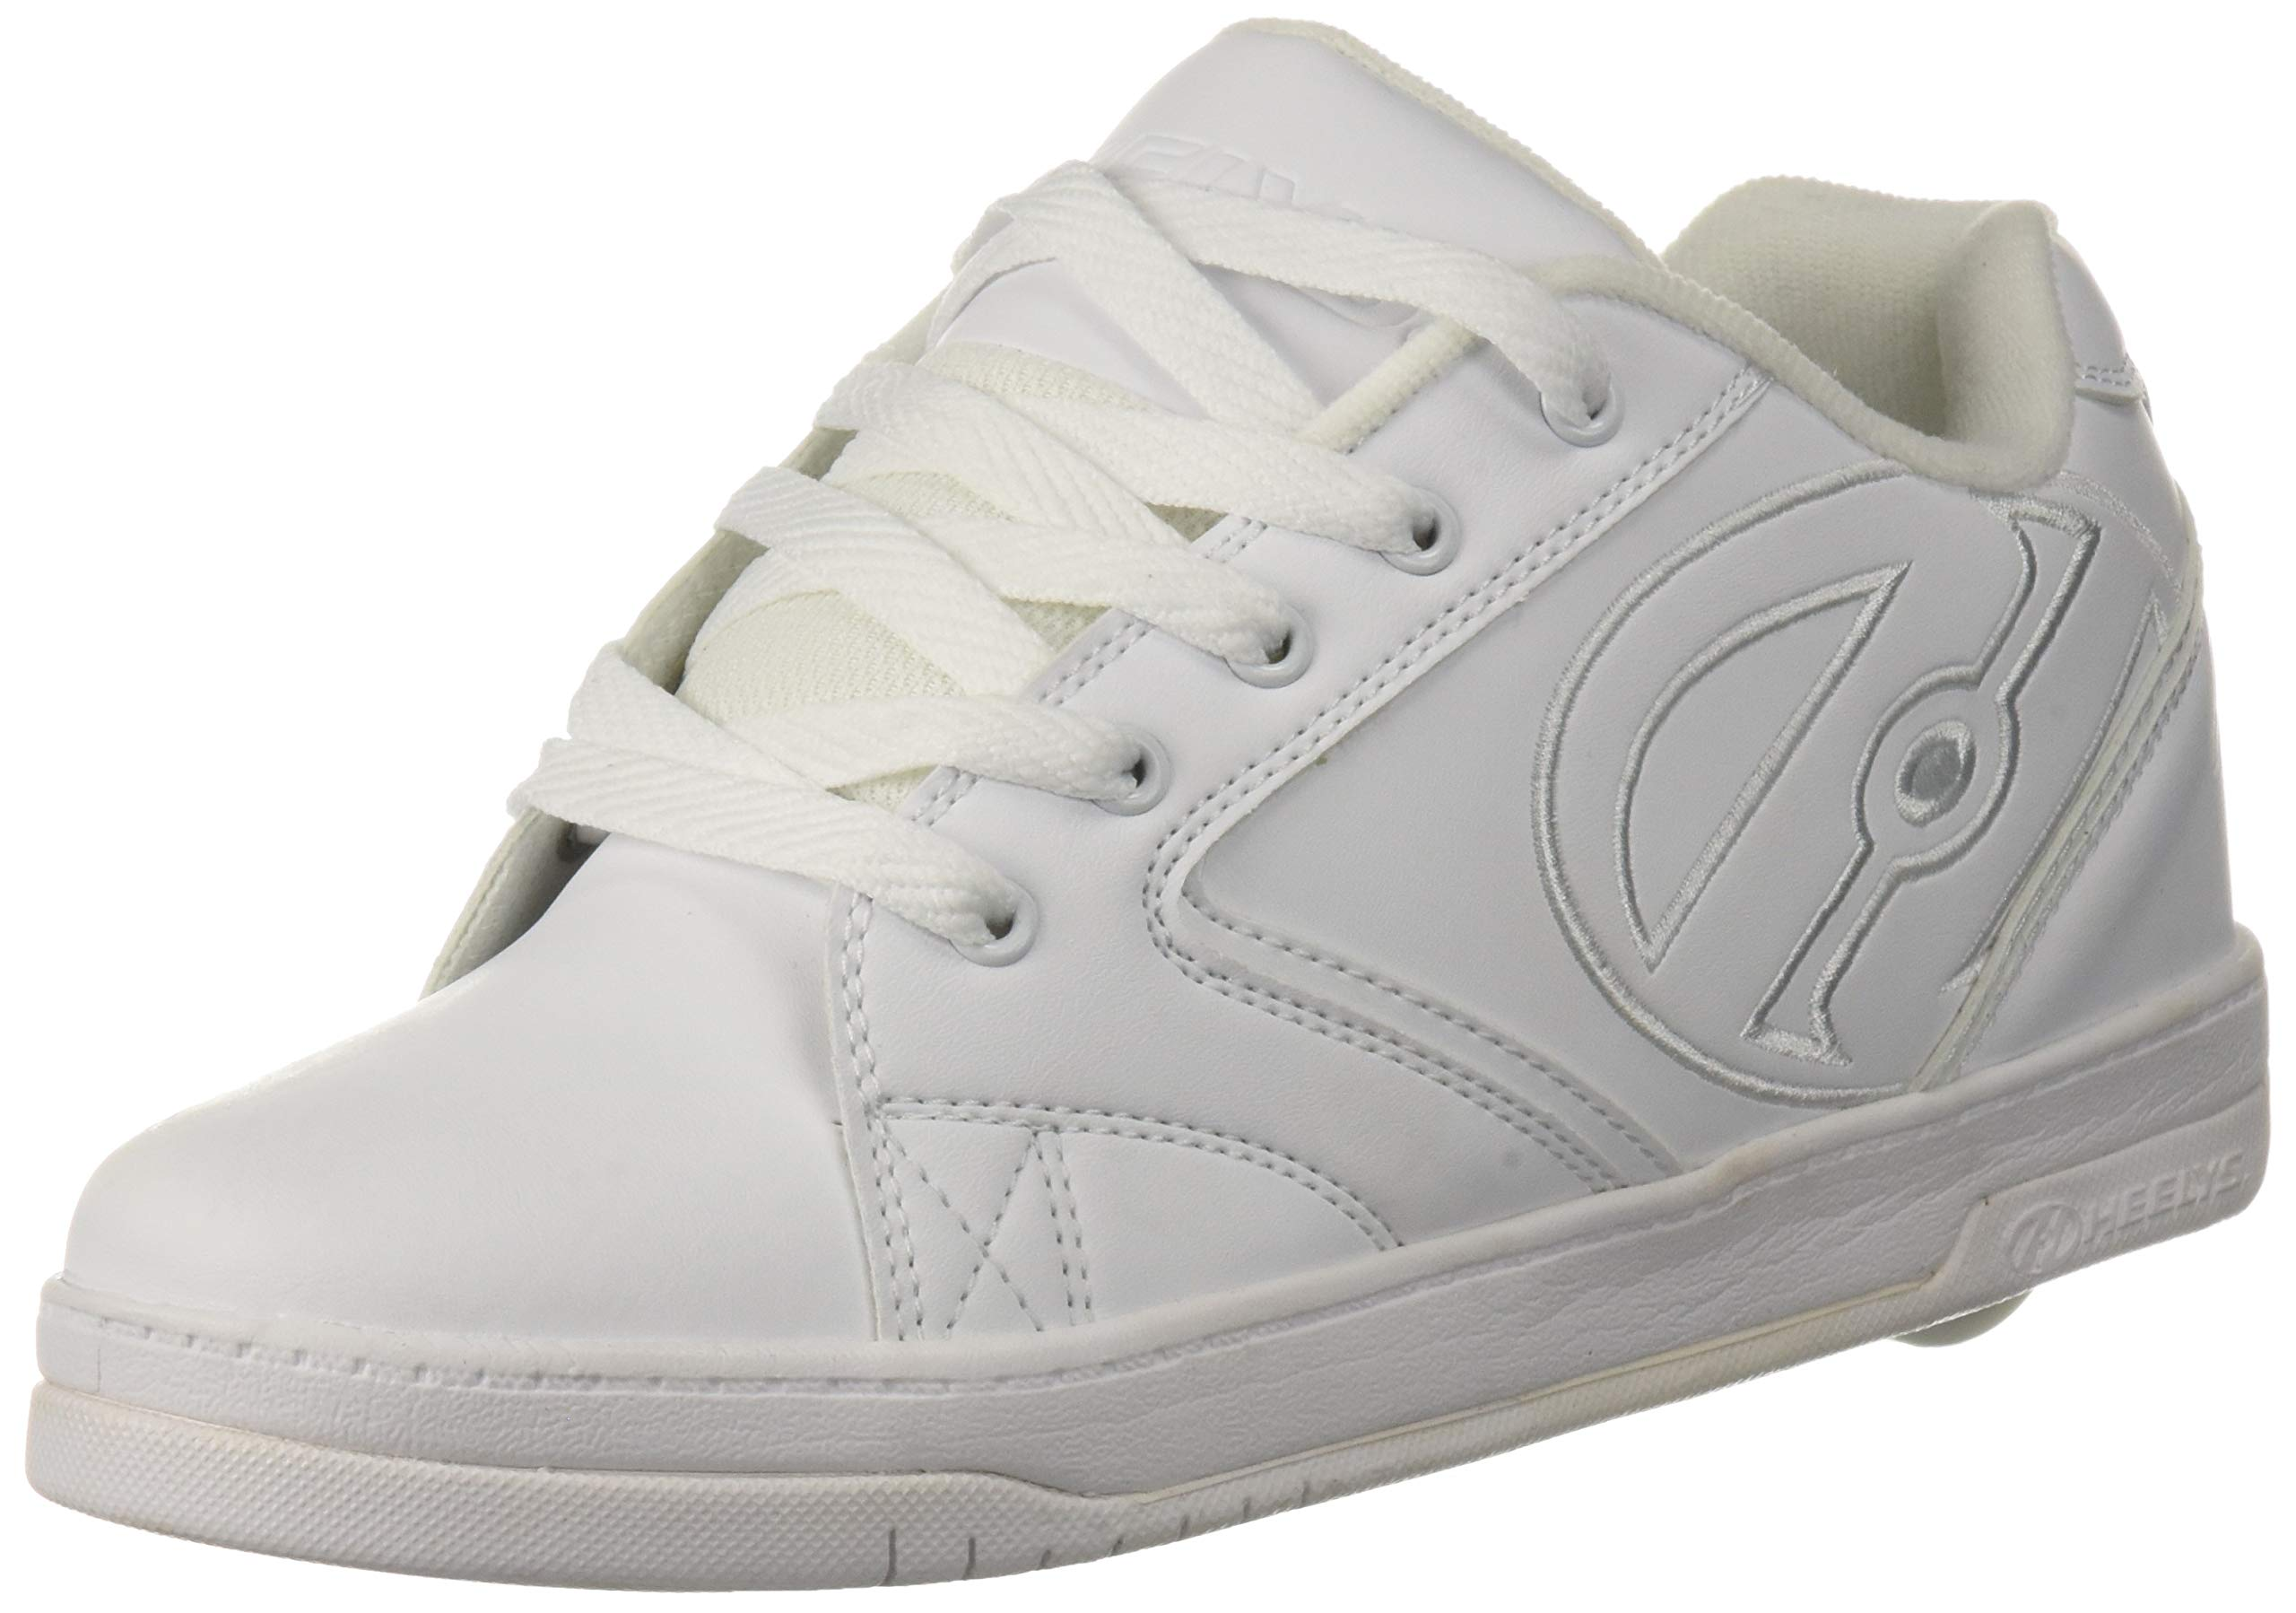 Heelys Unisex Propel 2.0 Tennis Shoe, White, 5 M US Big Kid